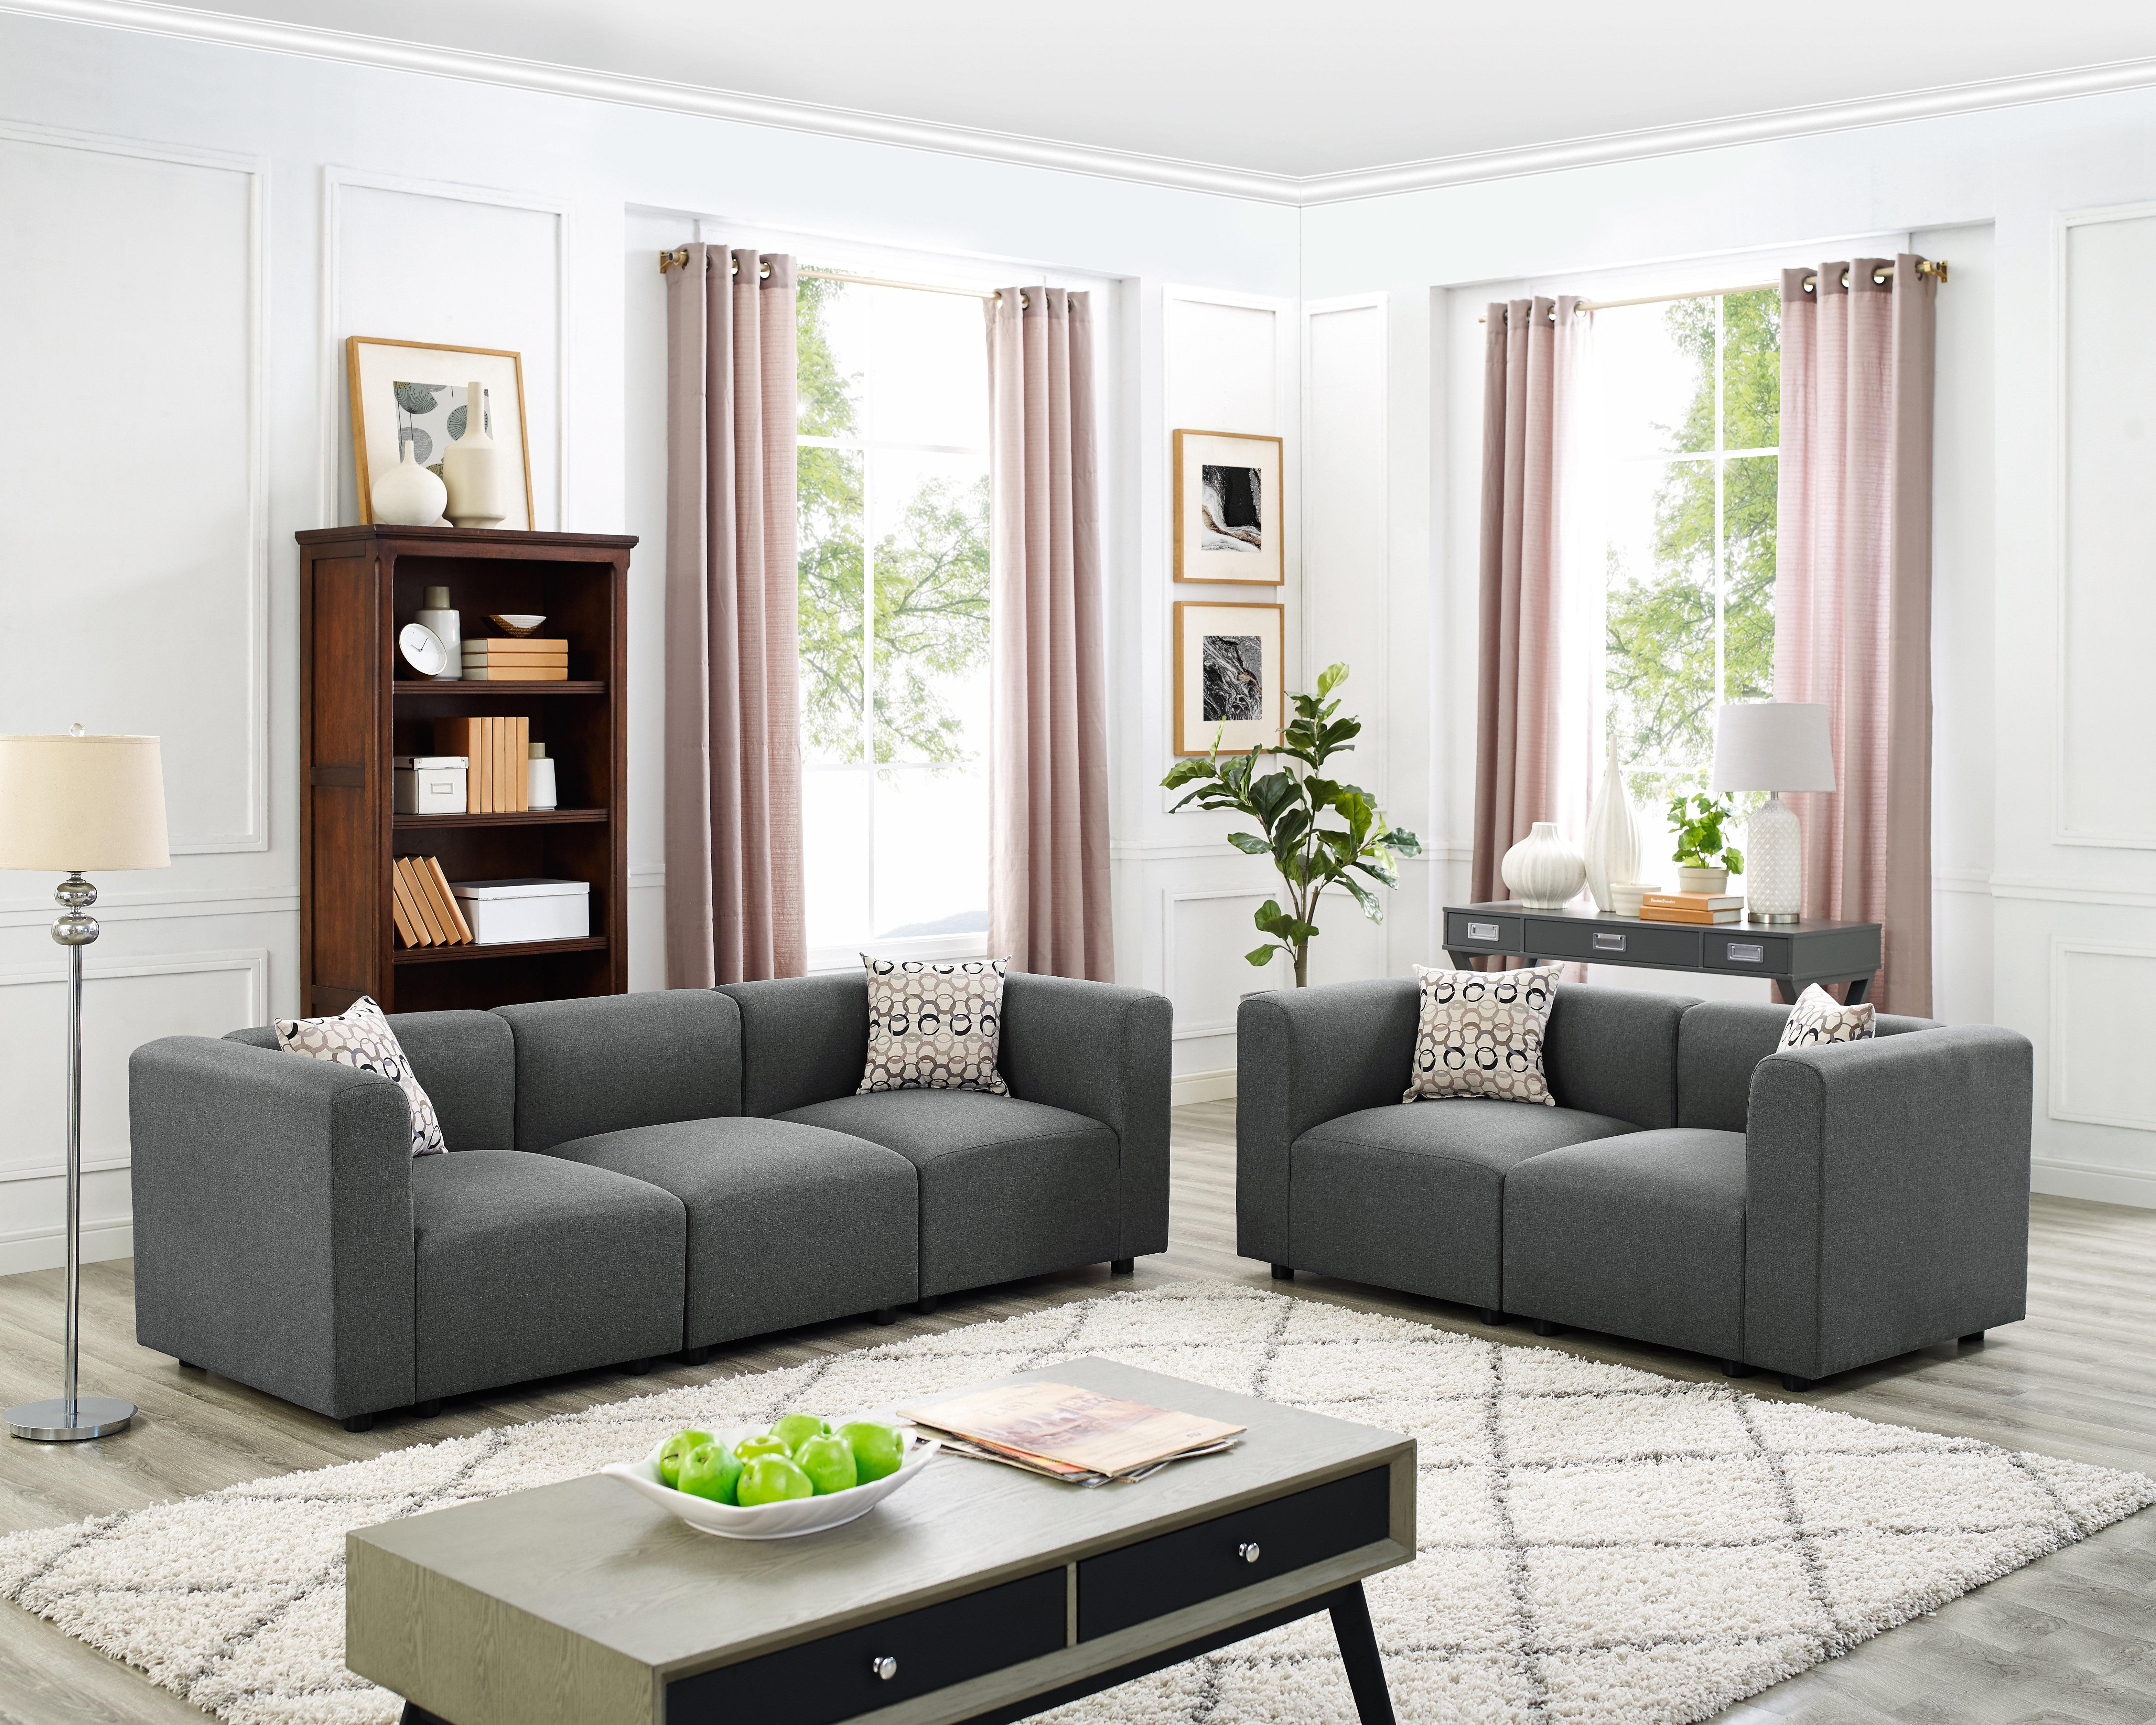 Zipcode Design Nash 2 Piece Modular Living Room Sofa Set | Wayfair